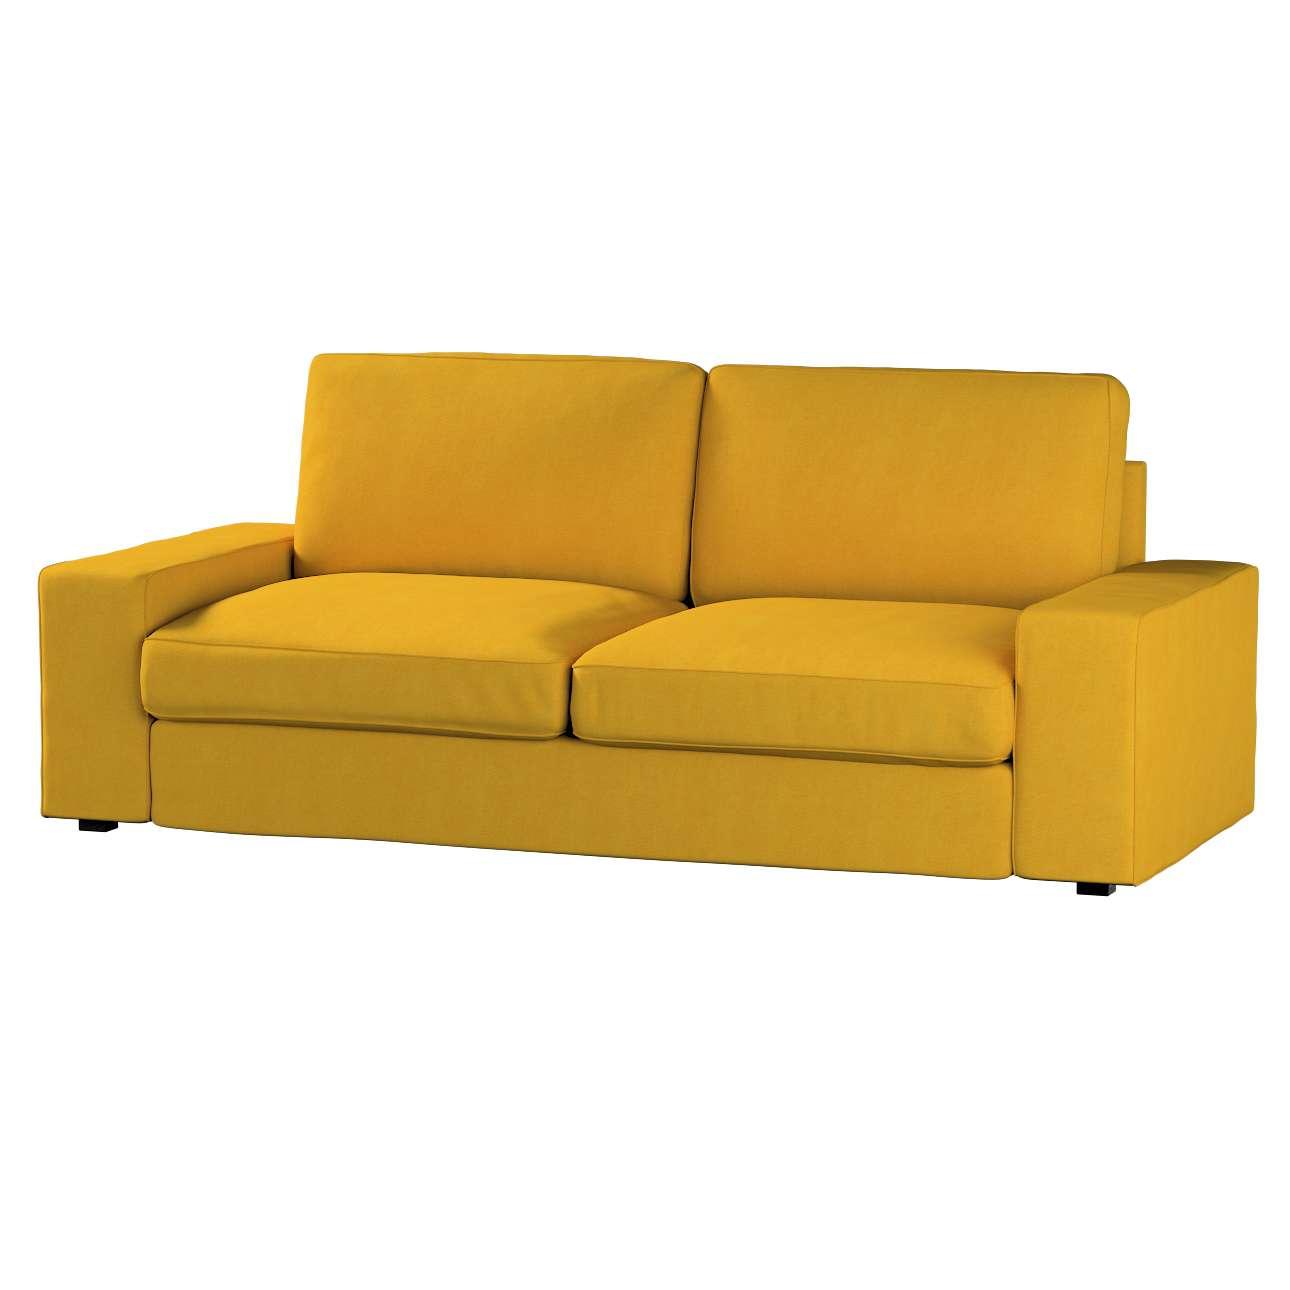 Kivik 3-Sitzer Sofabezug Sofa Kivik 3-Sitzer von der Kollektion Etna, Stoff: 705-04